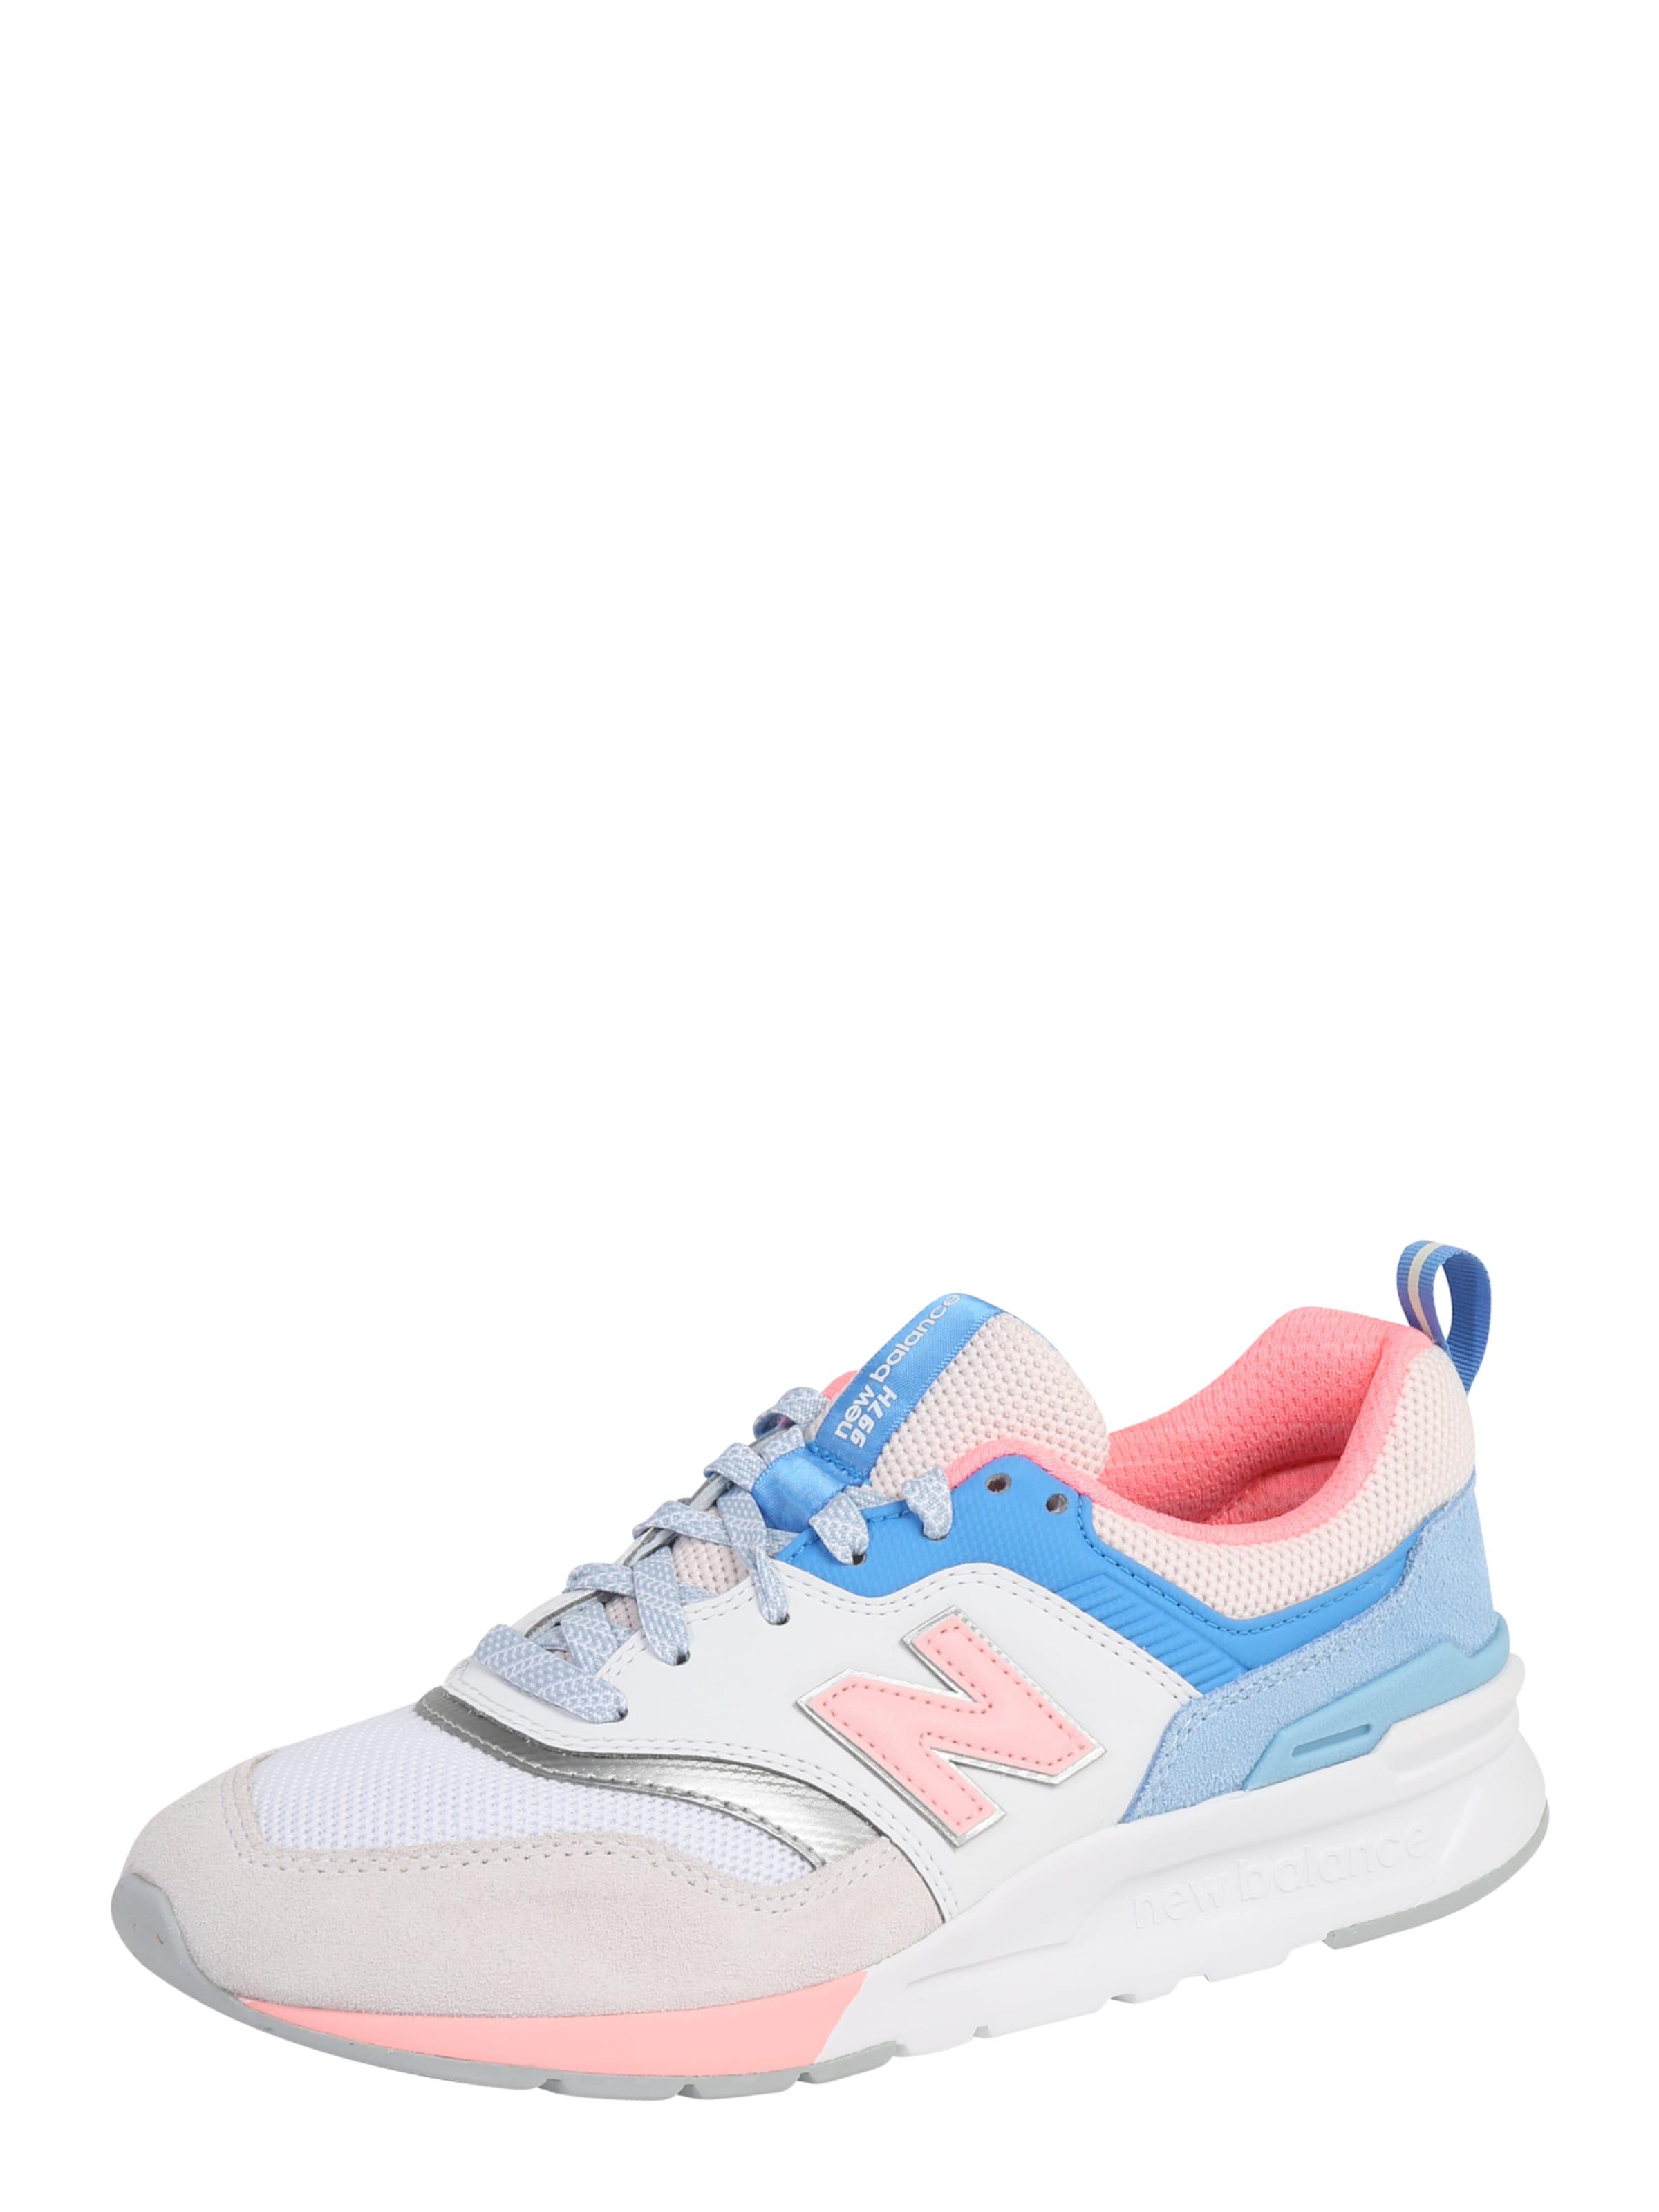 Balance New 'cw En Bleu ClairRose Blanc Basses 997' Baskets kuOZXPi